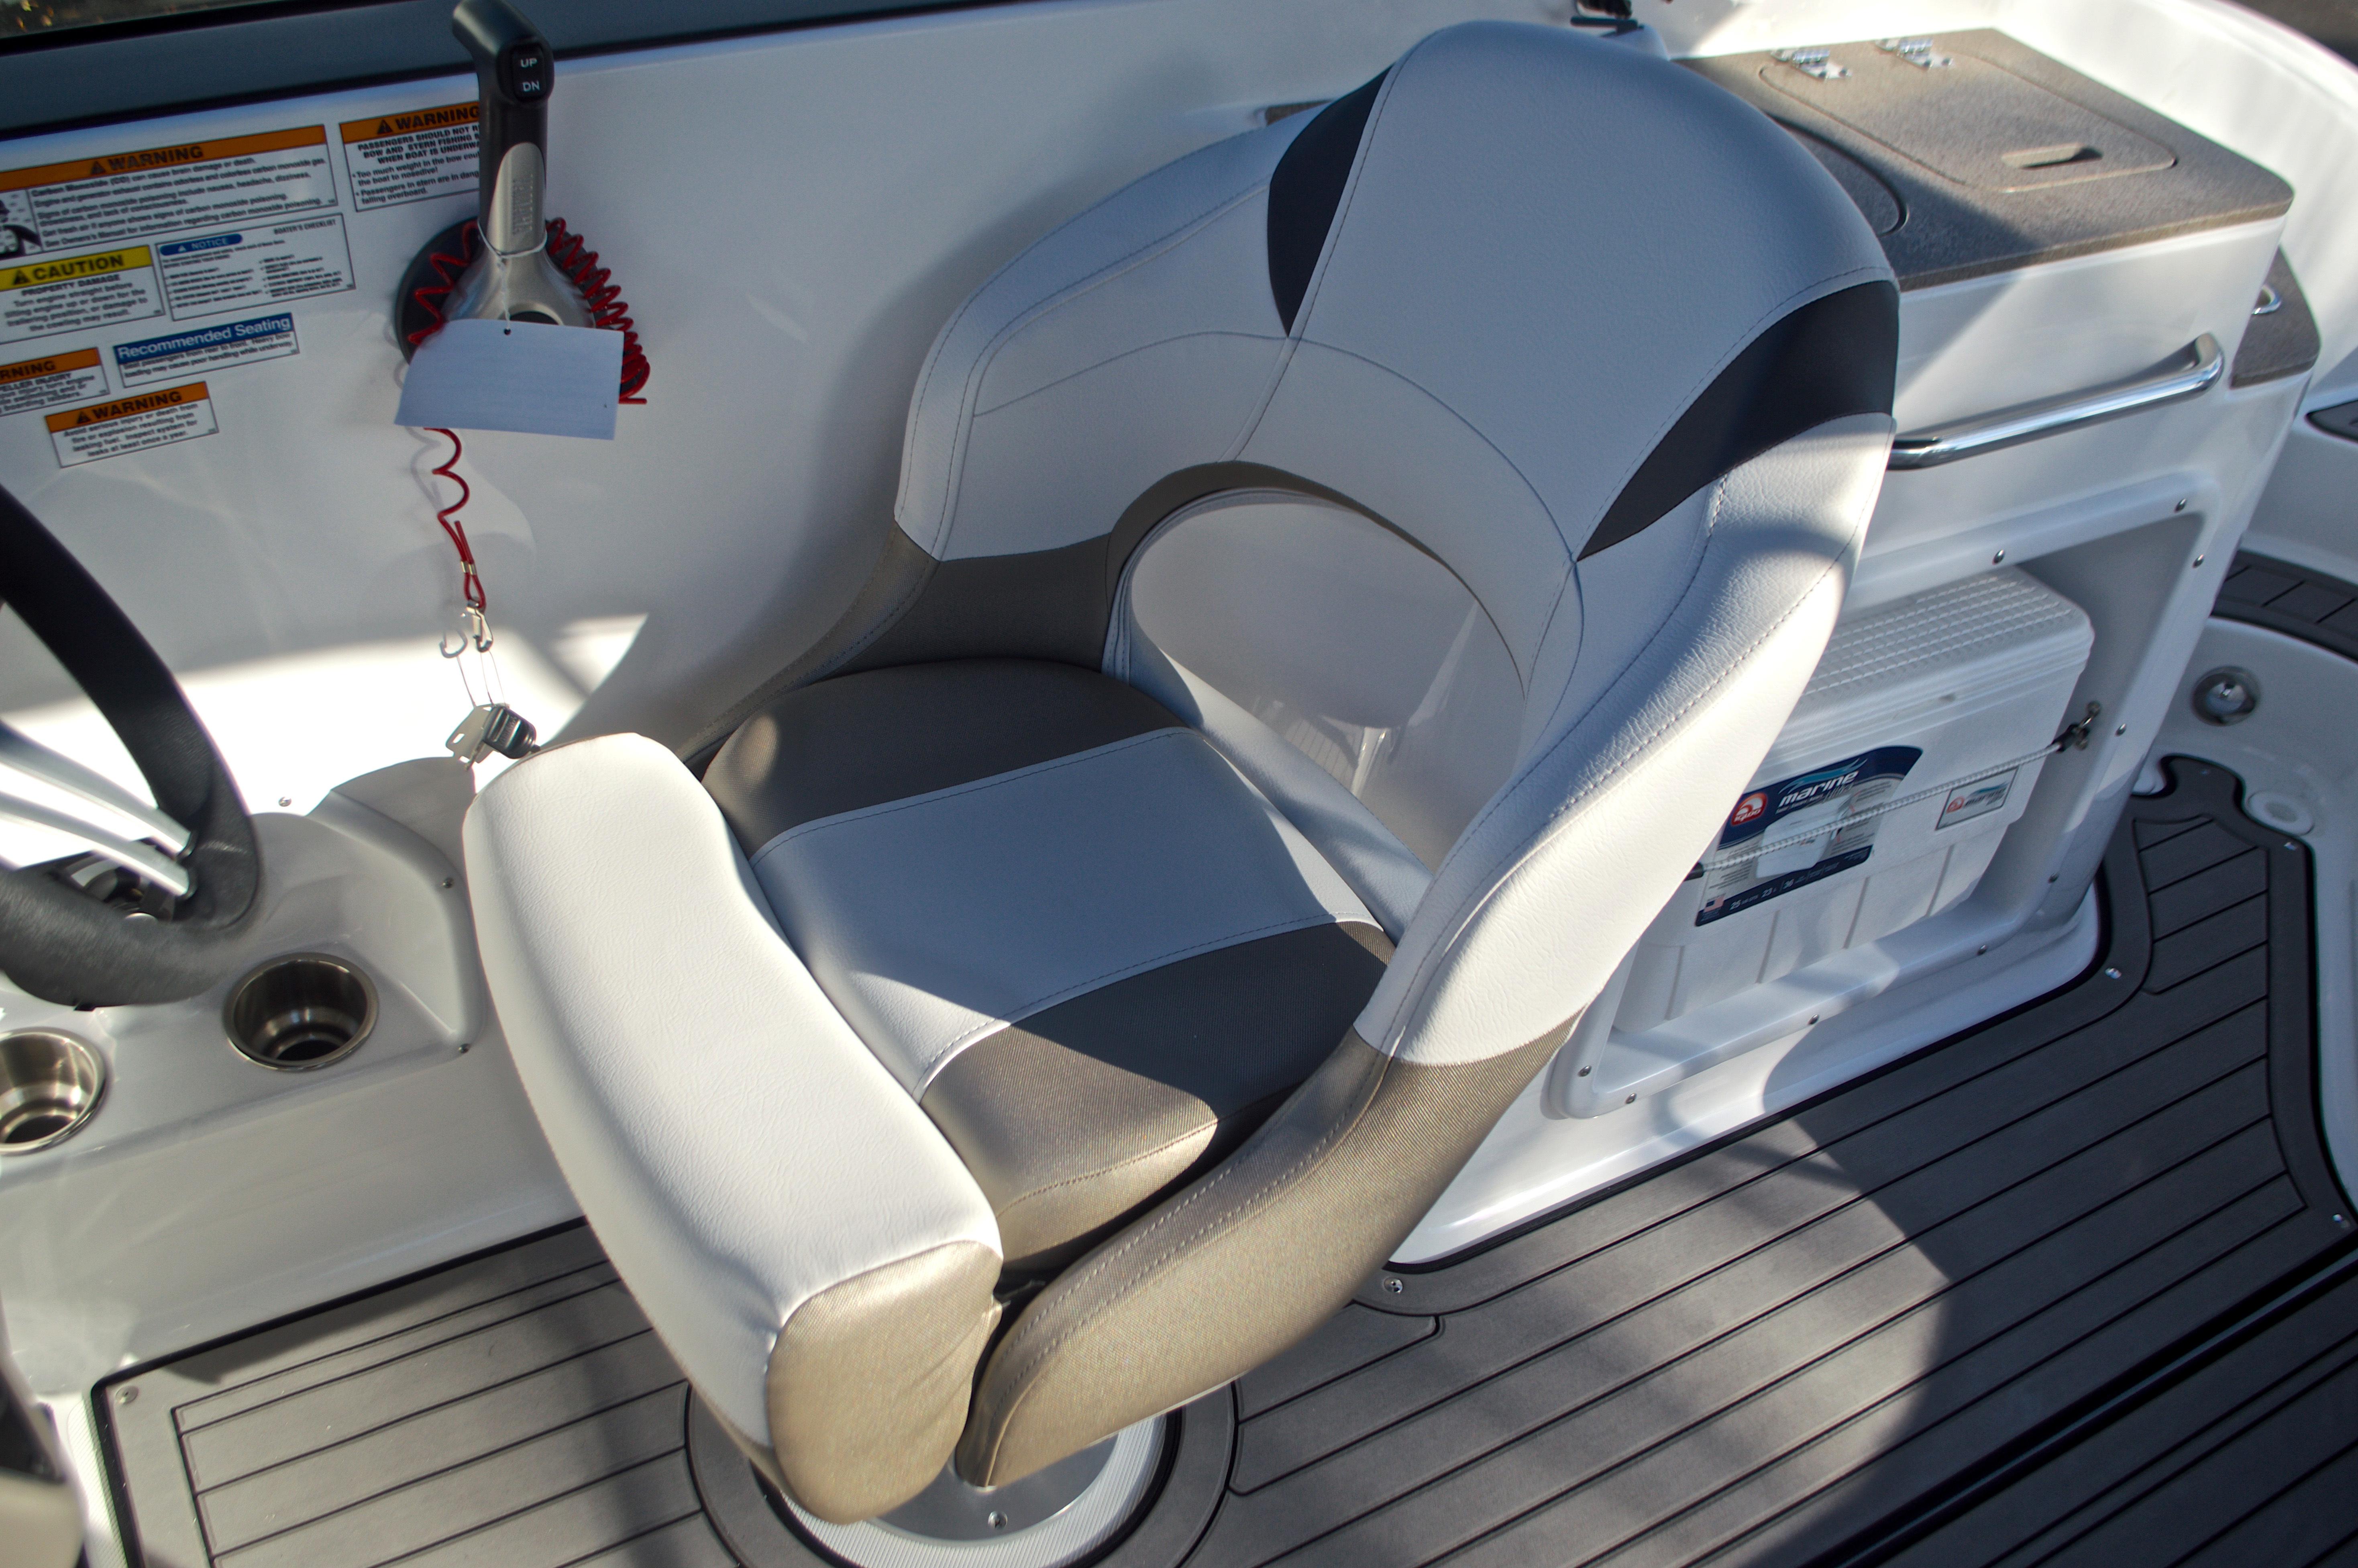 Thumbnail 37 for New 2017 Hurricane SunDeck SD 2400 OB boat for sale in Miami, FL